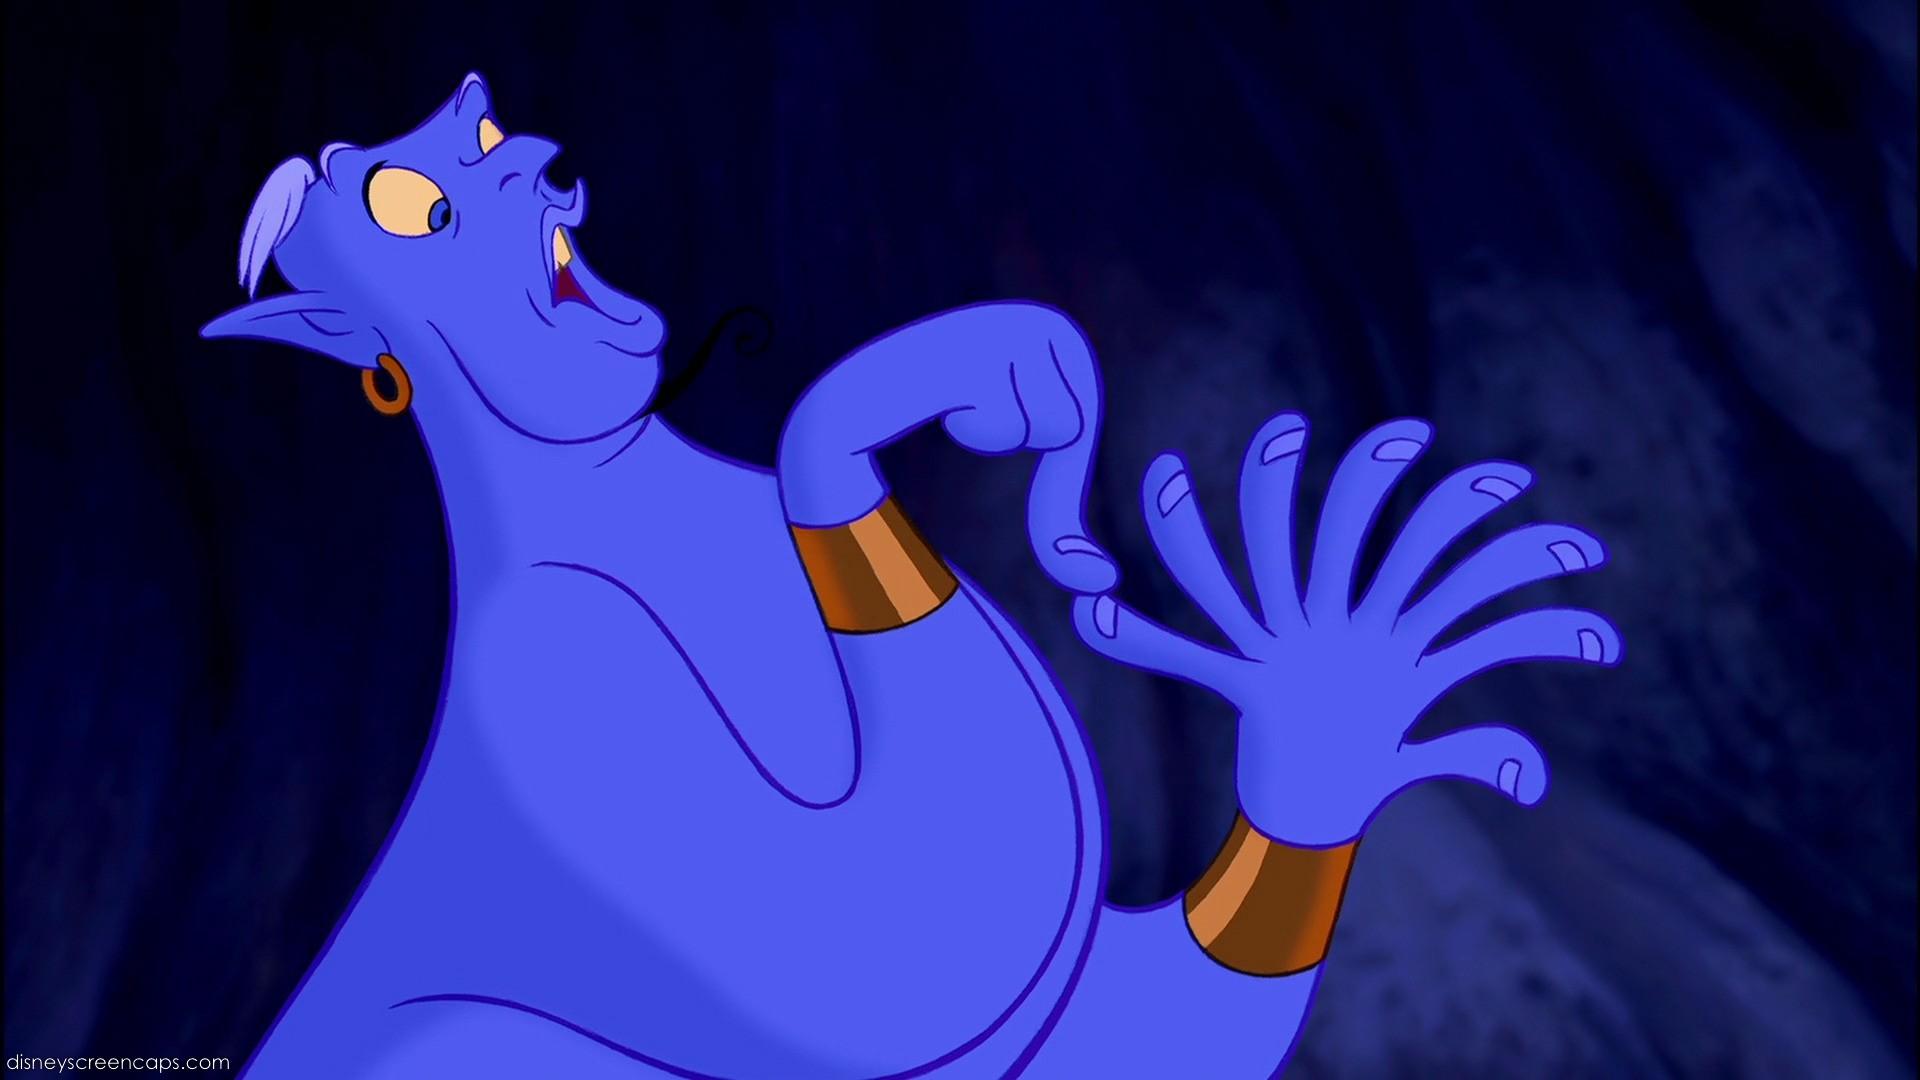 Image - Aladdin-disneyscreencaps.com-4574.jpg | Disney Wiki ... for Genie Aladdin Quotes  49jwn